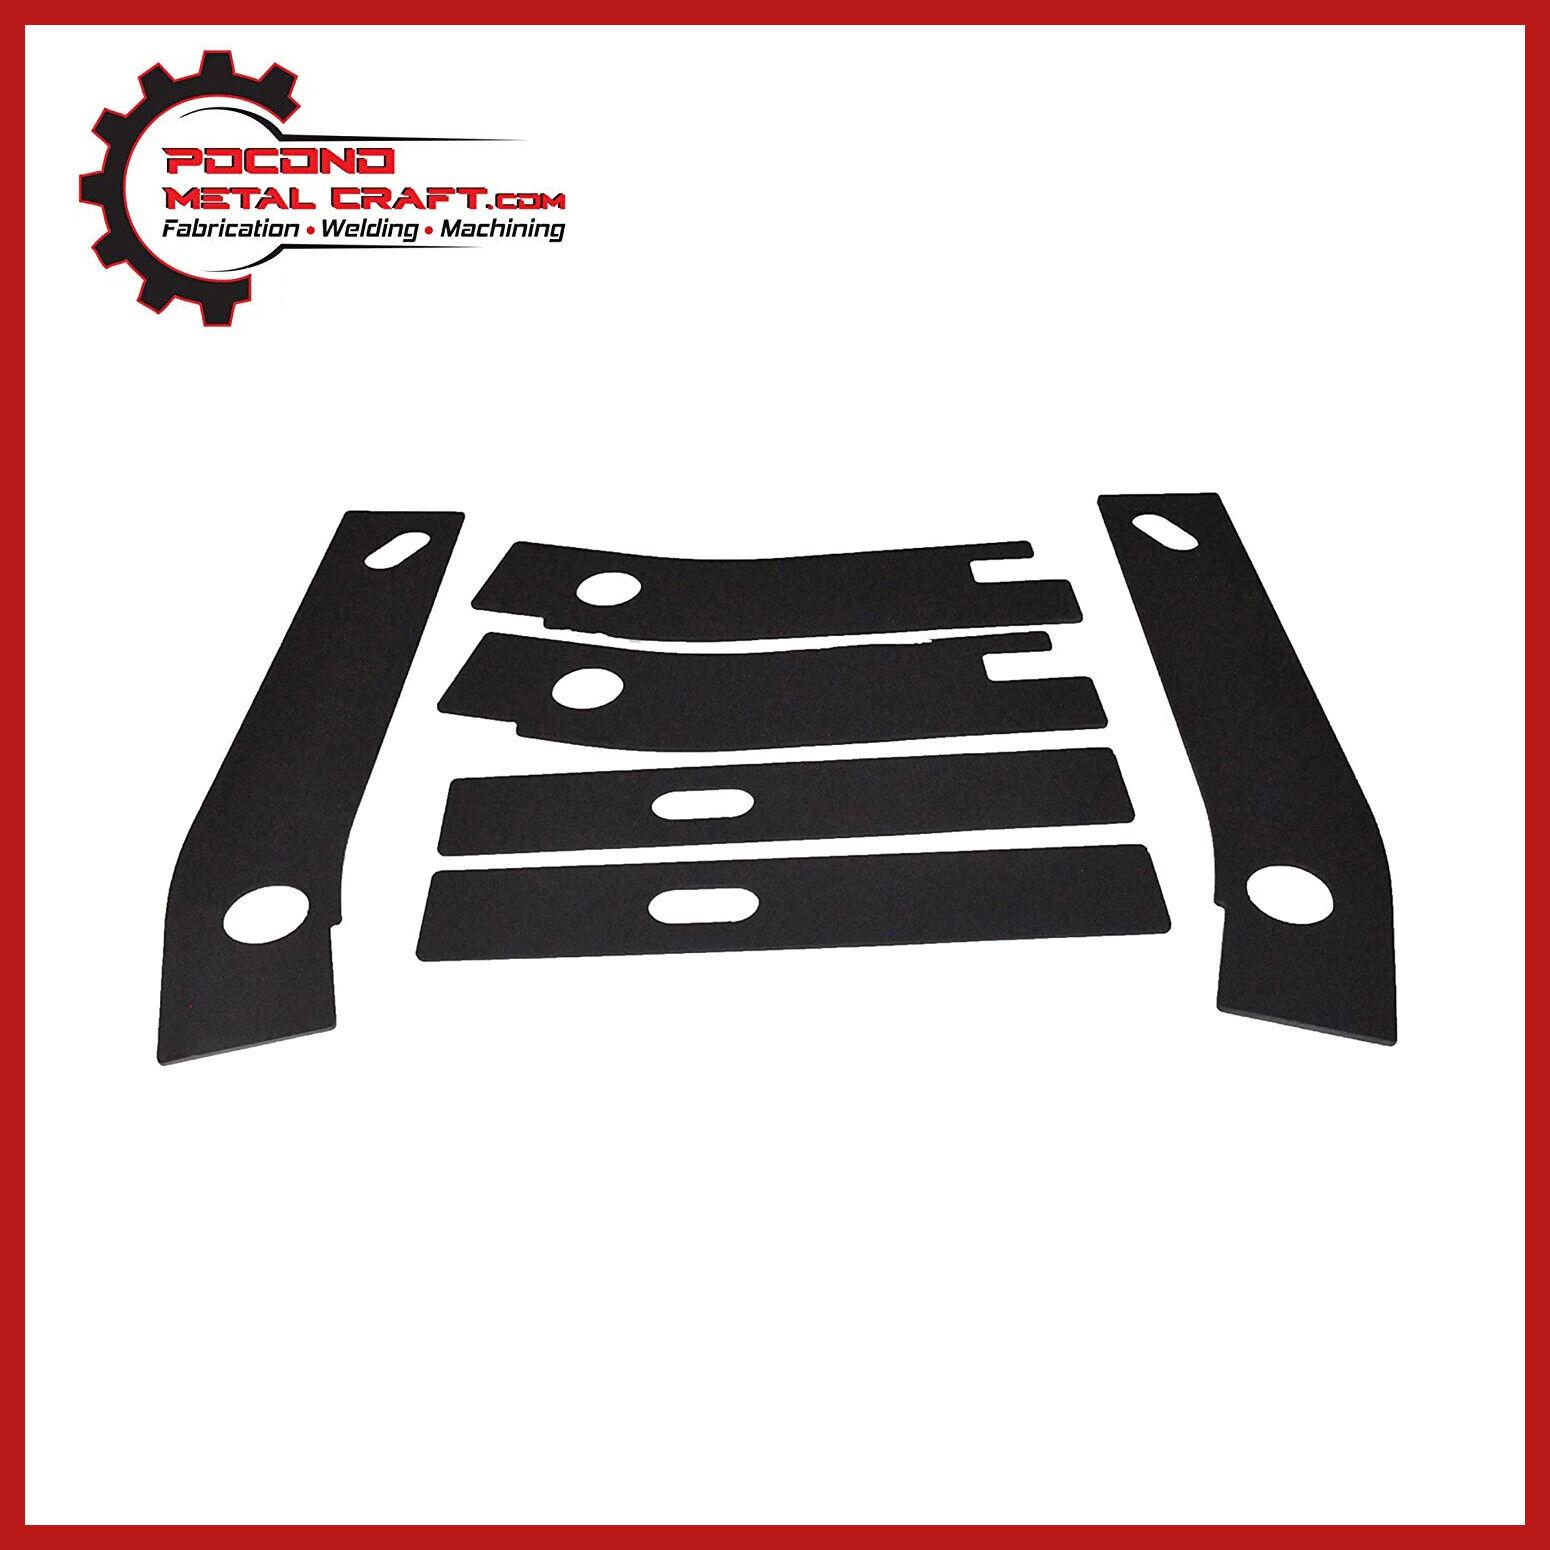 6 Pc Frame Rust Repair Shackle Weld Plates Jeep Wrangler YJ Rear ...